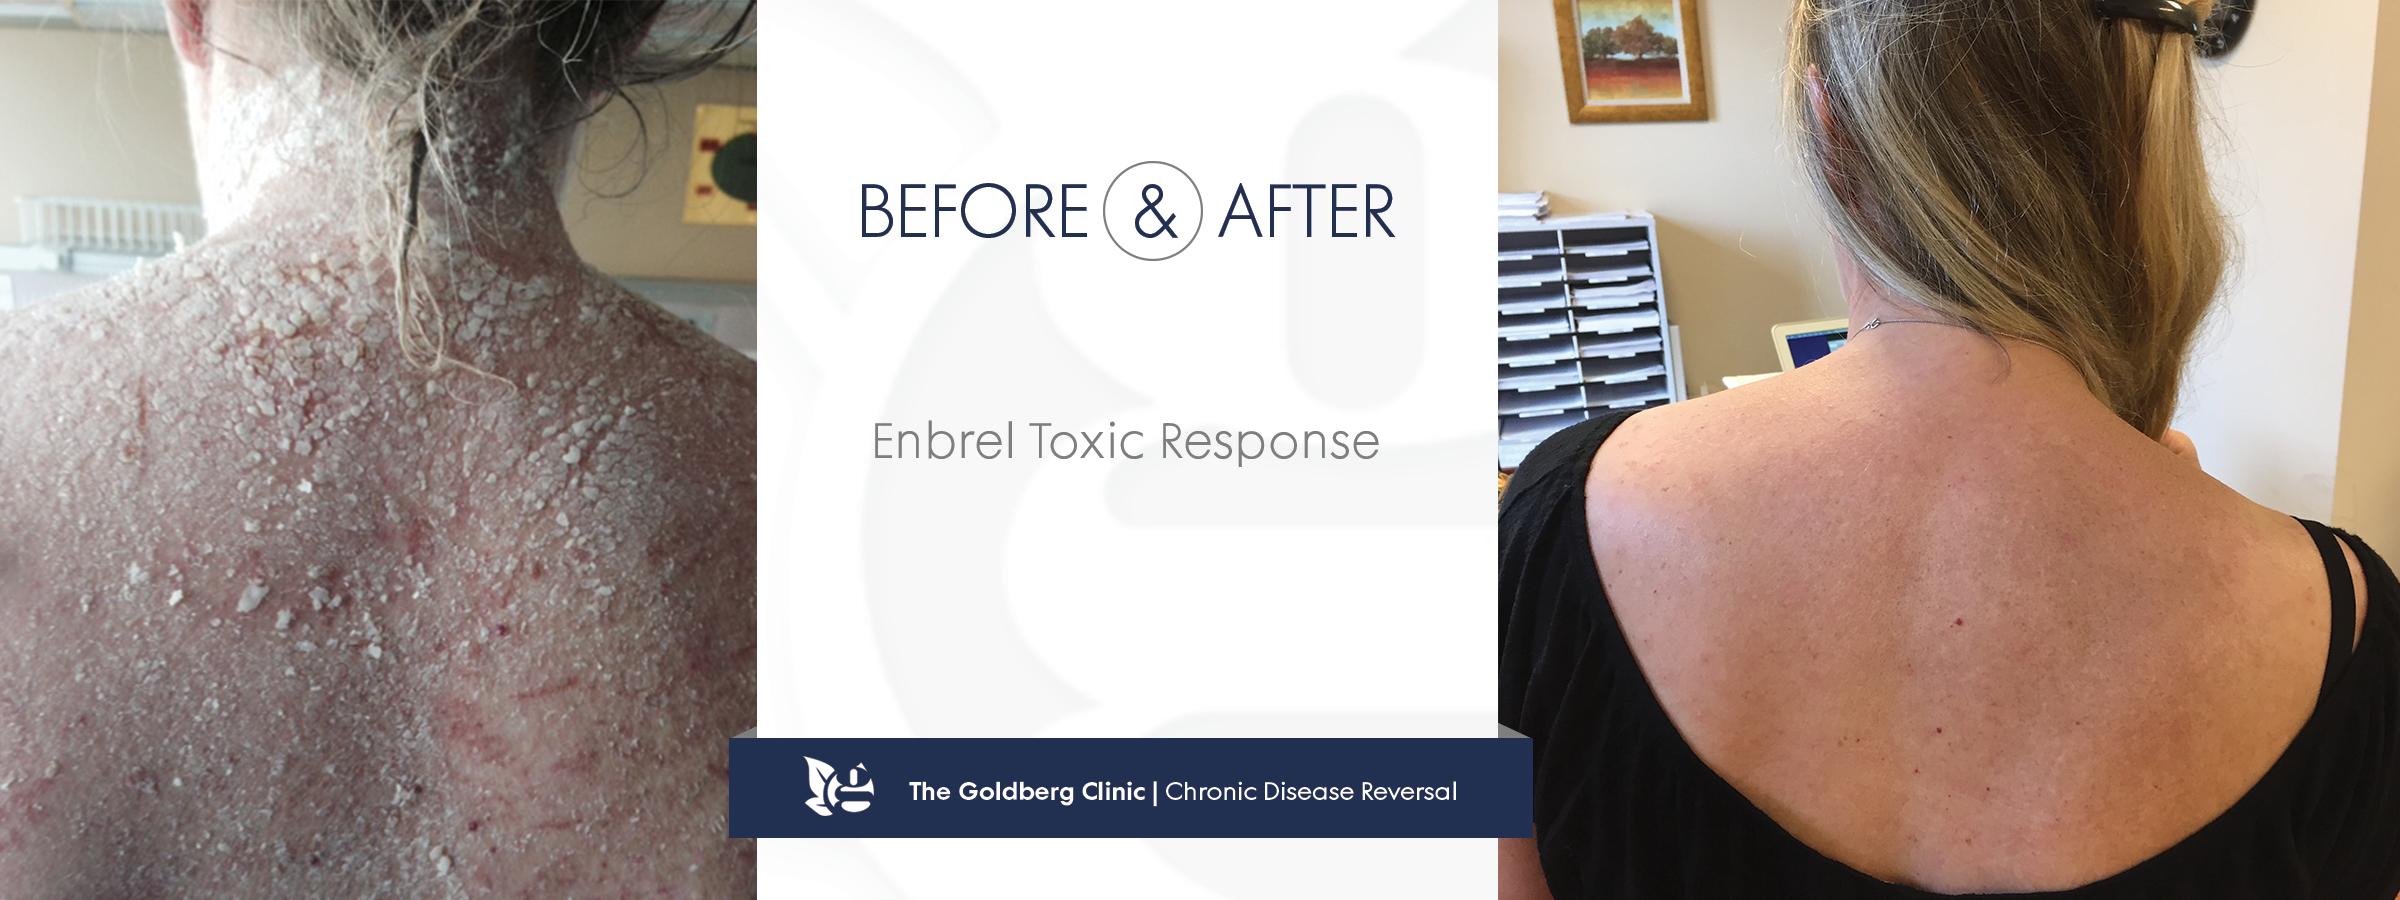 Enbrel Toxic Response